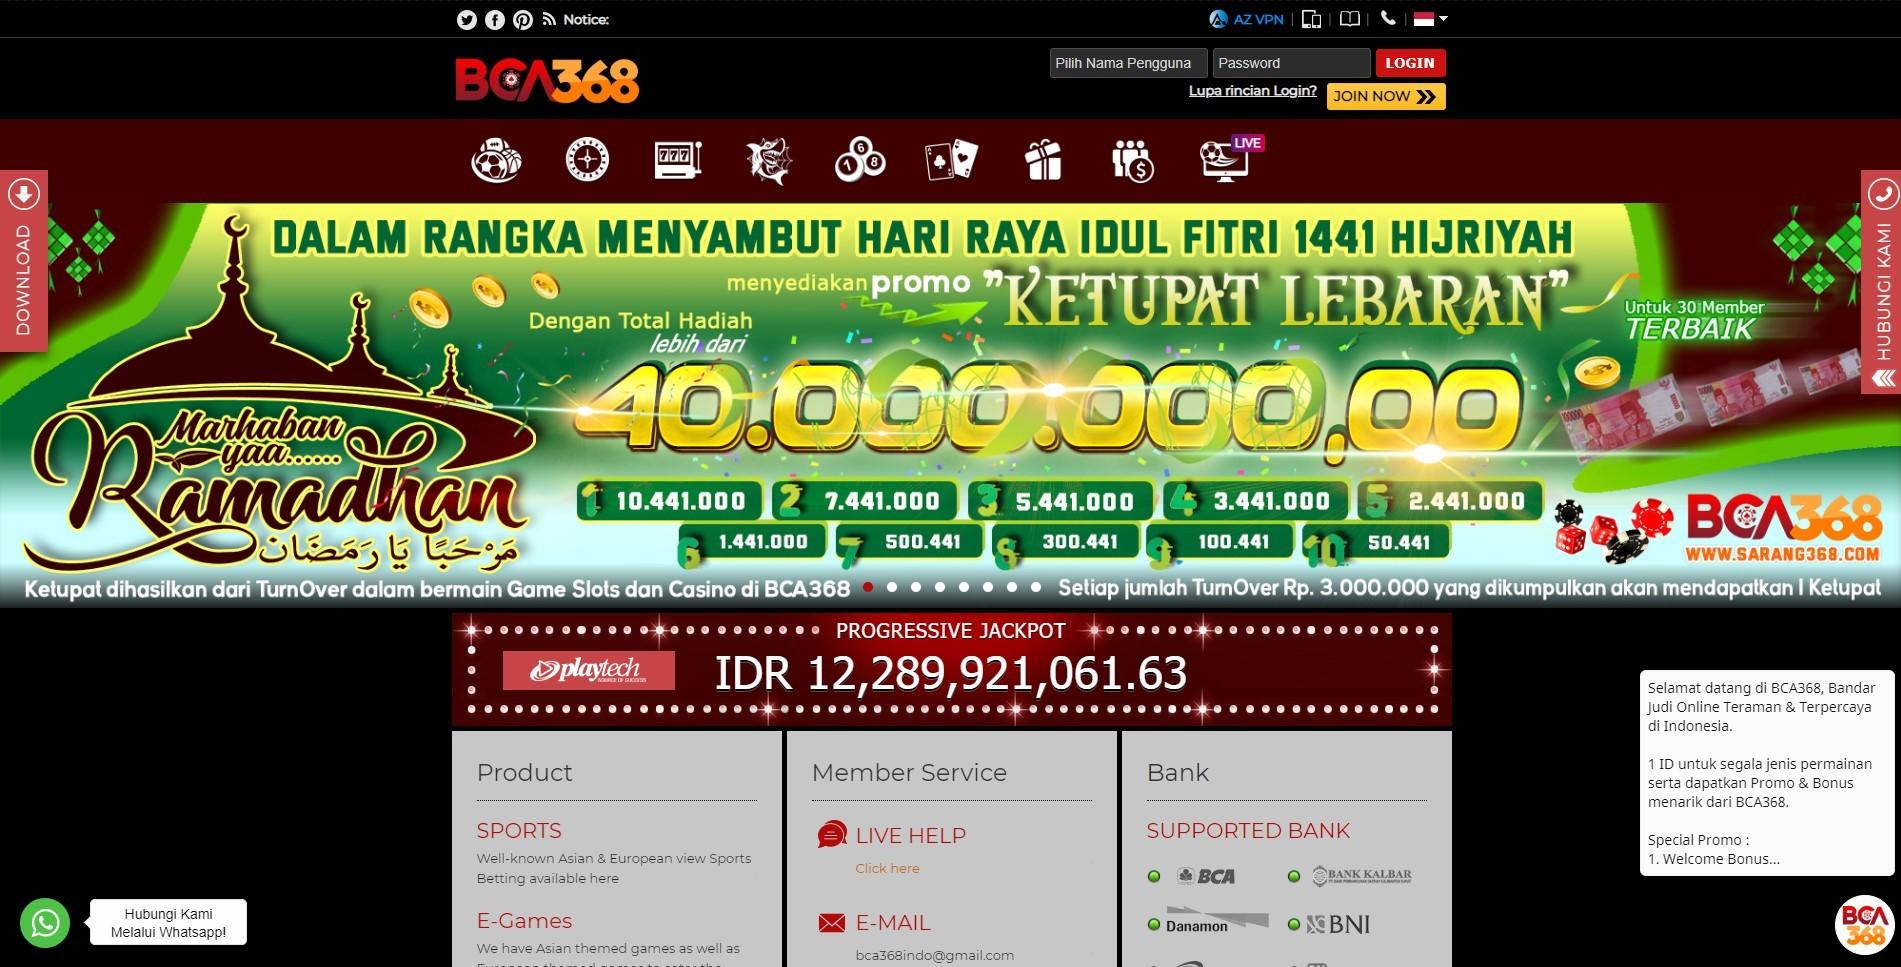 Situs Judi Bola Terpercaya Agen Sbobet Online Terbaik Indonesia Teletype